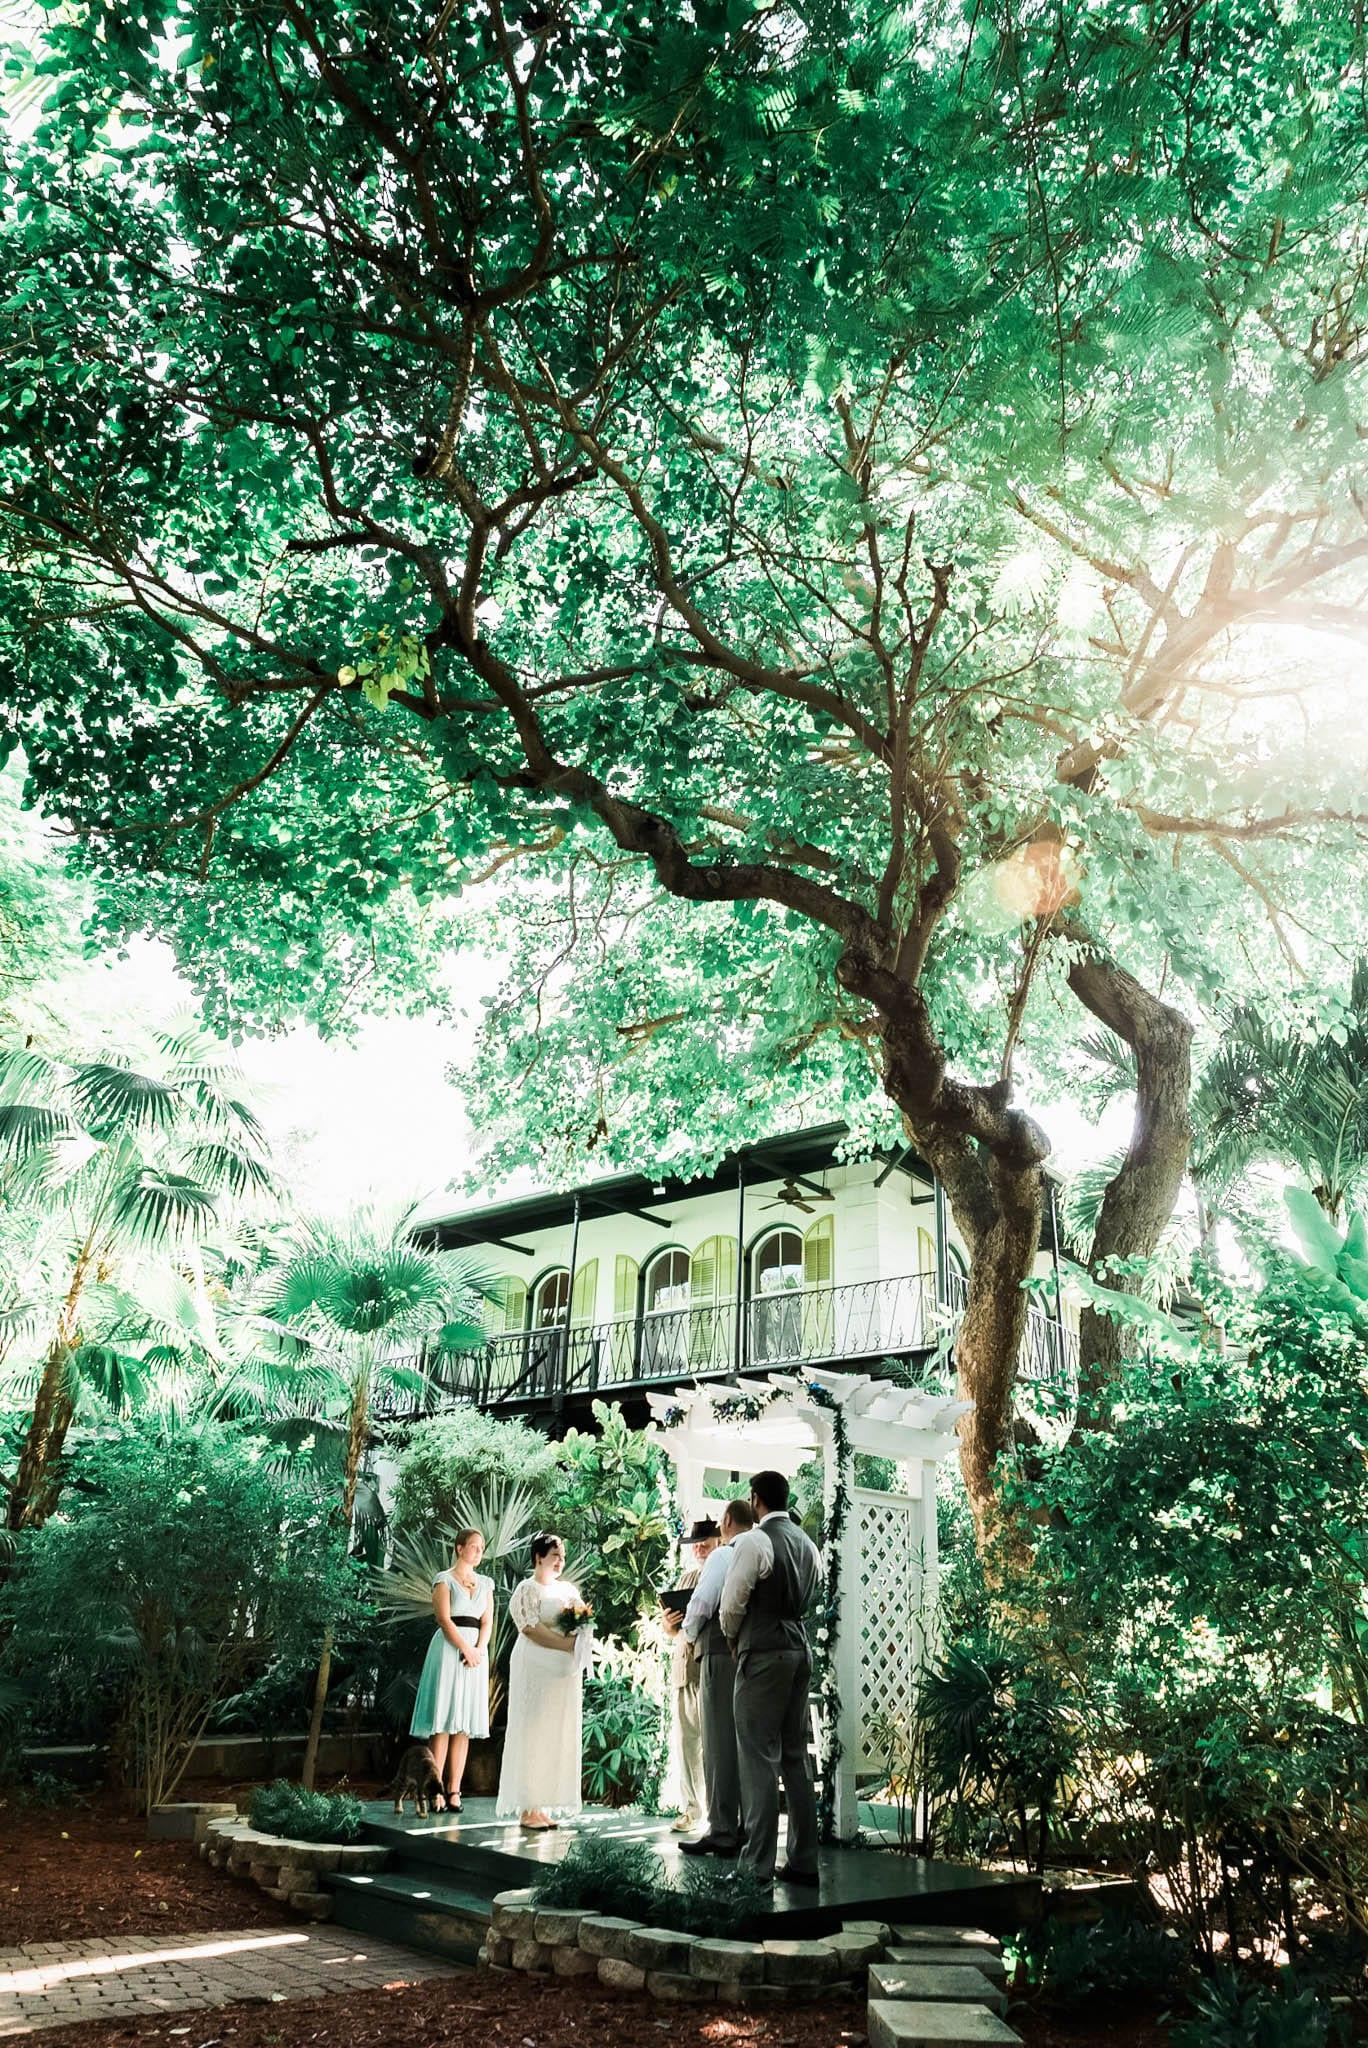 Becca and Leigh Hemingway Home Key West 154 - Becca & Leigh - Key West Wedding Photographer - Ernest Hemingway House